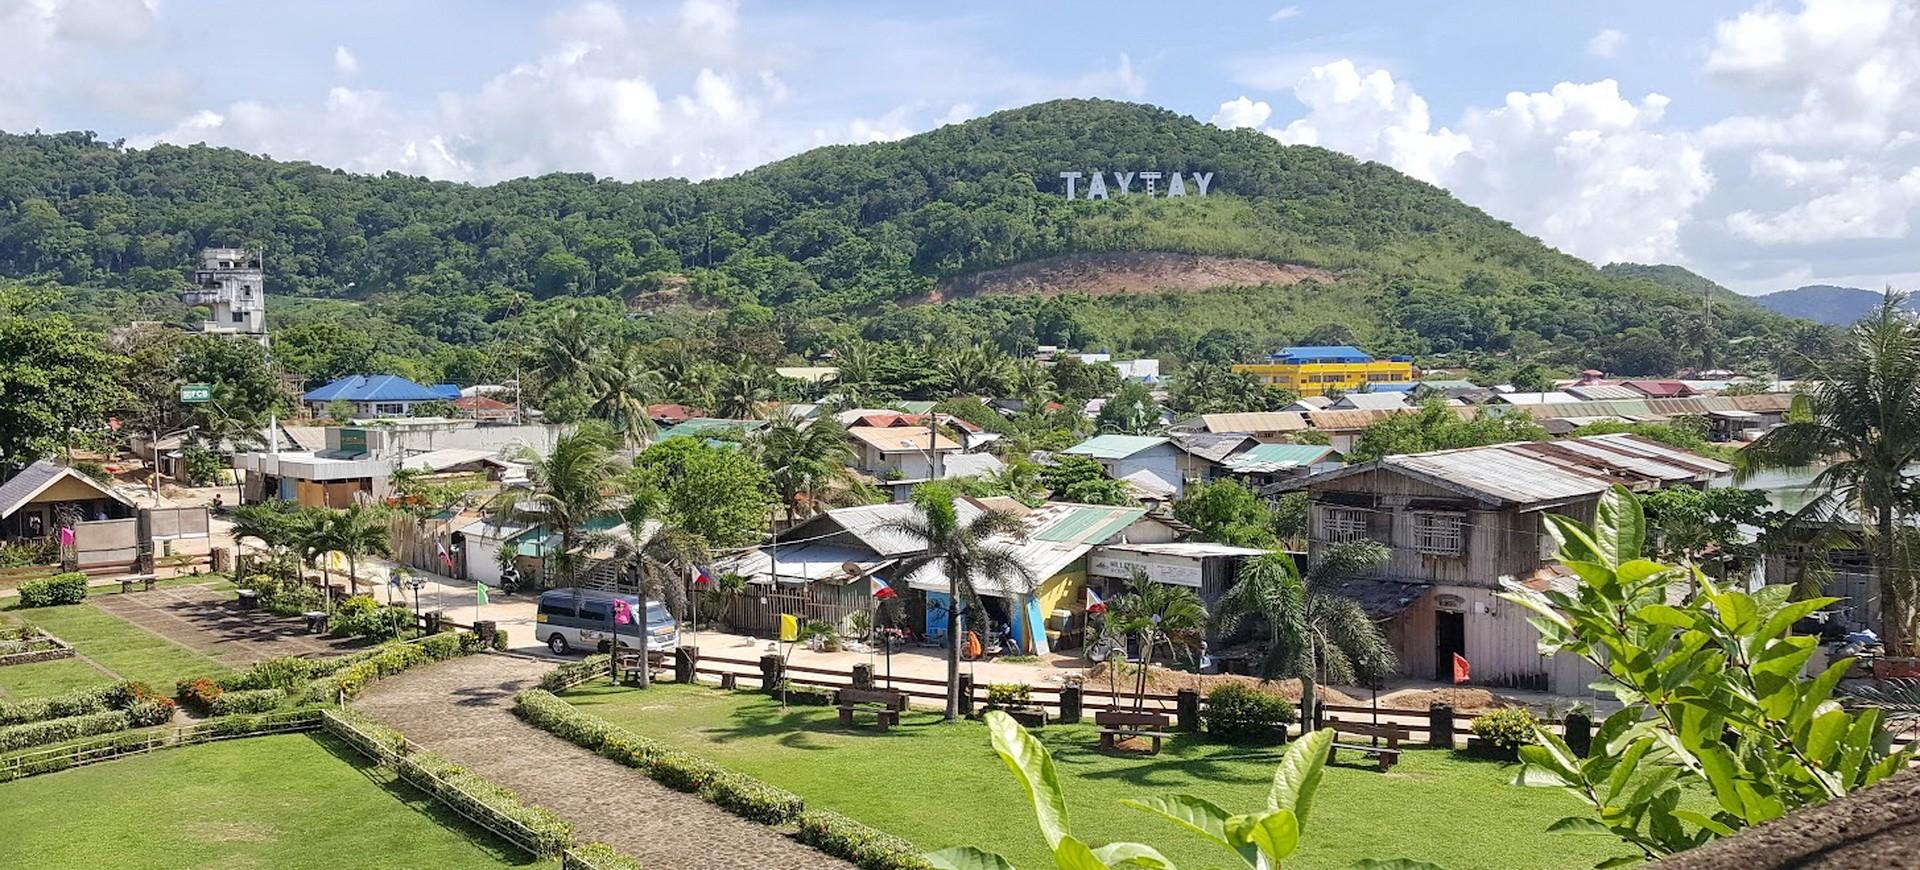 Philippines Ile de Palawan Taytay